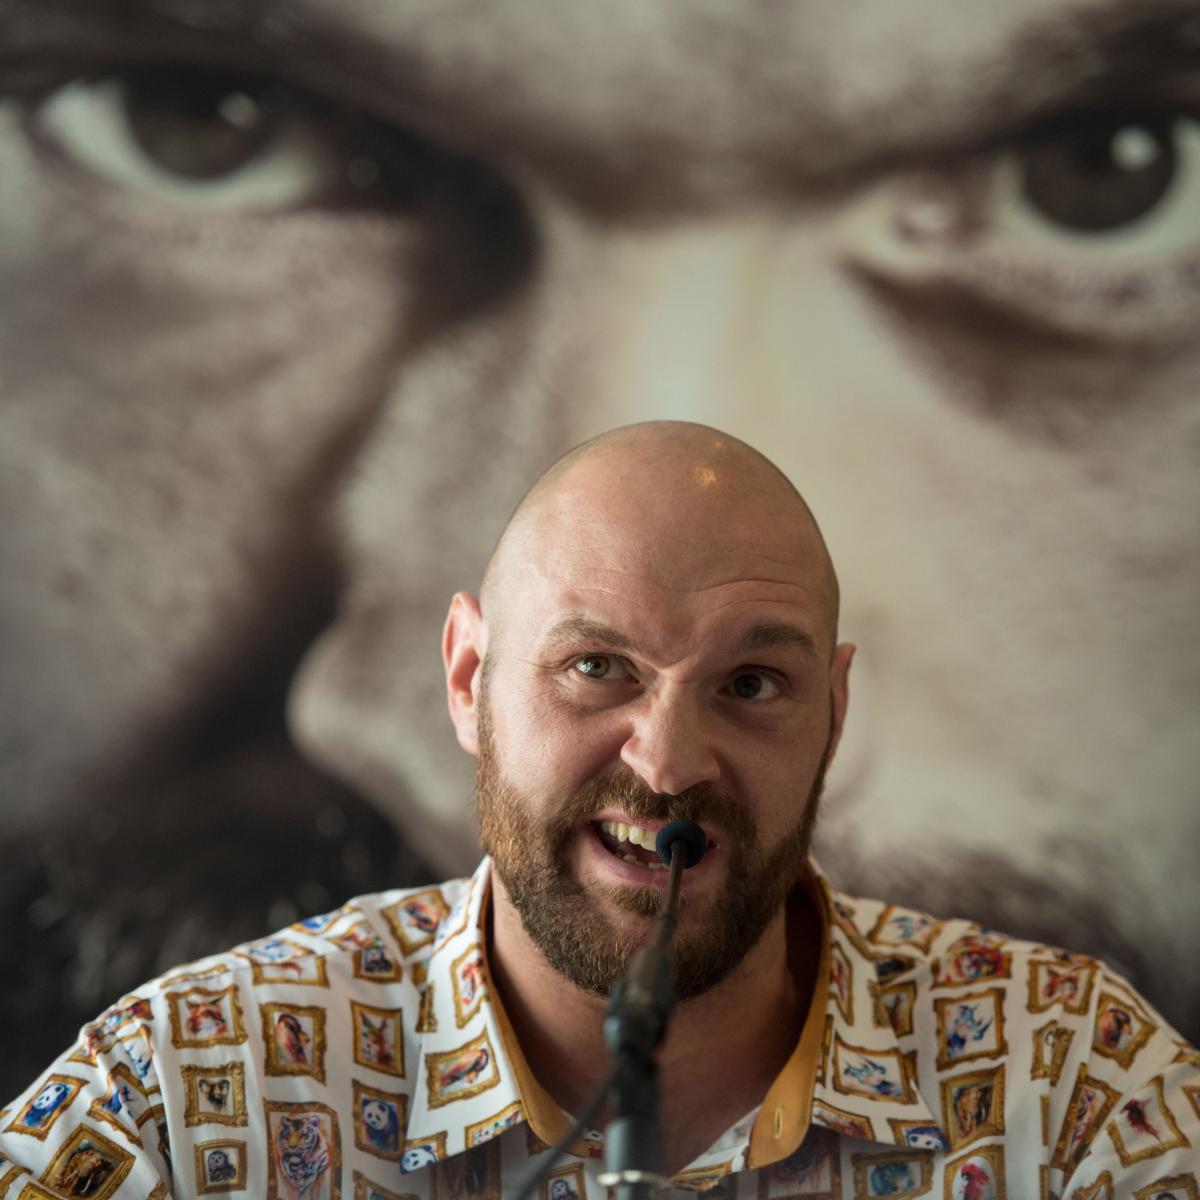 Tyson Fury Calls Out Tony Bellew, David Haye, Talks